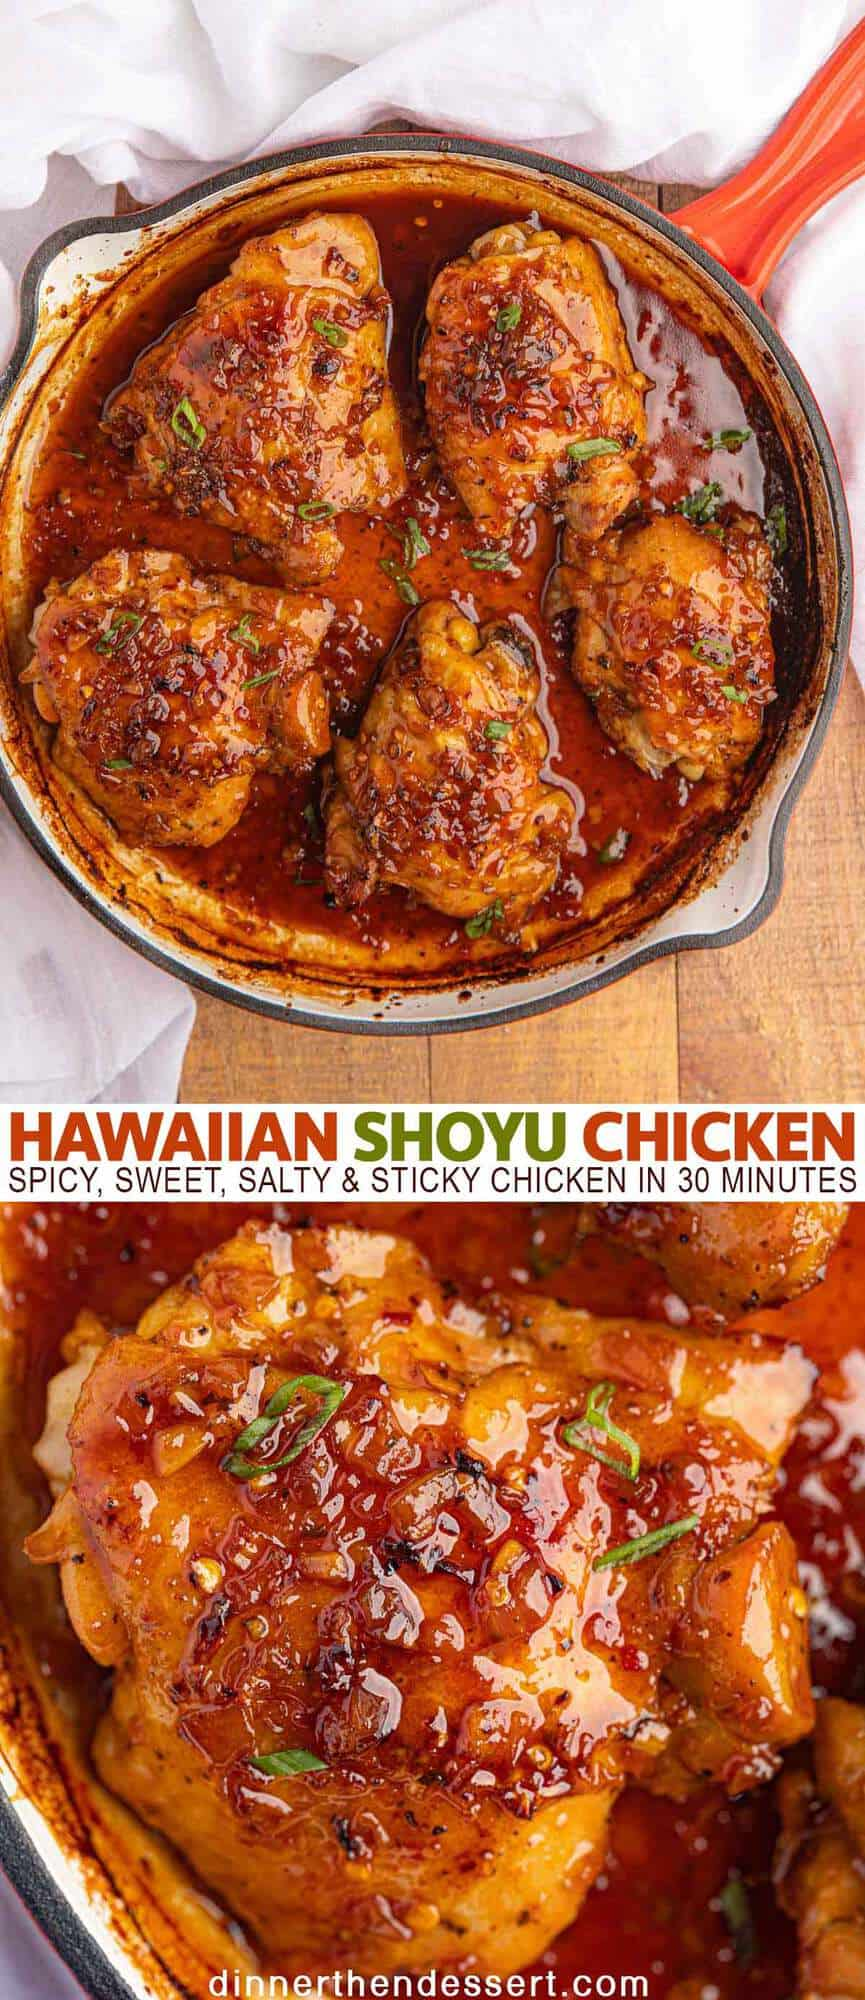 Hawaiian Shoyu Chicken Sticky Sweet In 30 Mins Dinner Then Dessert